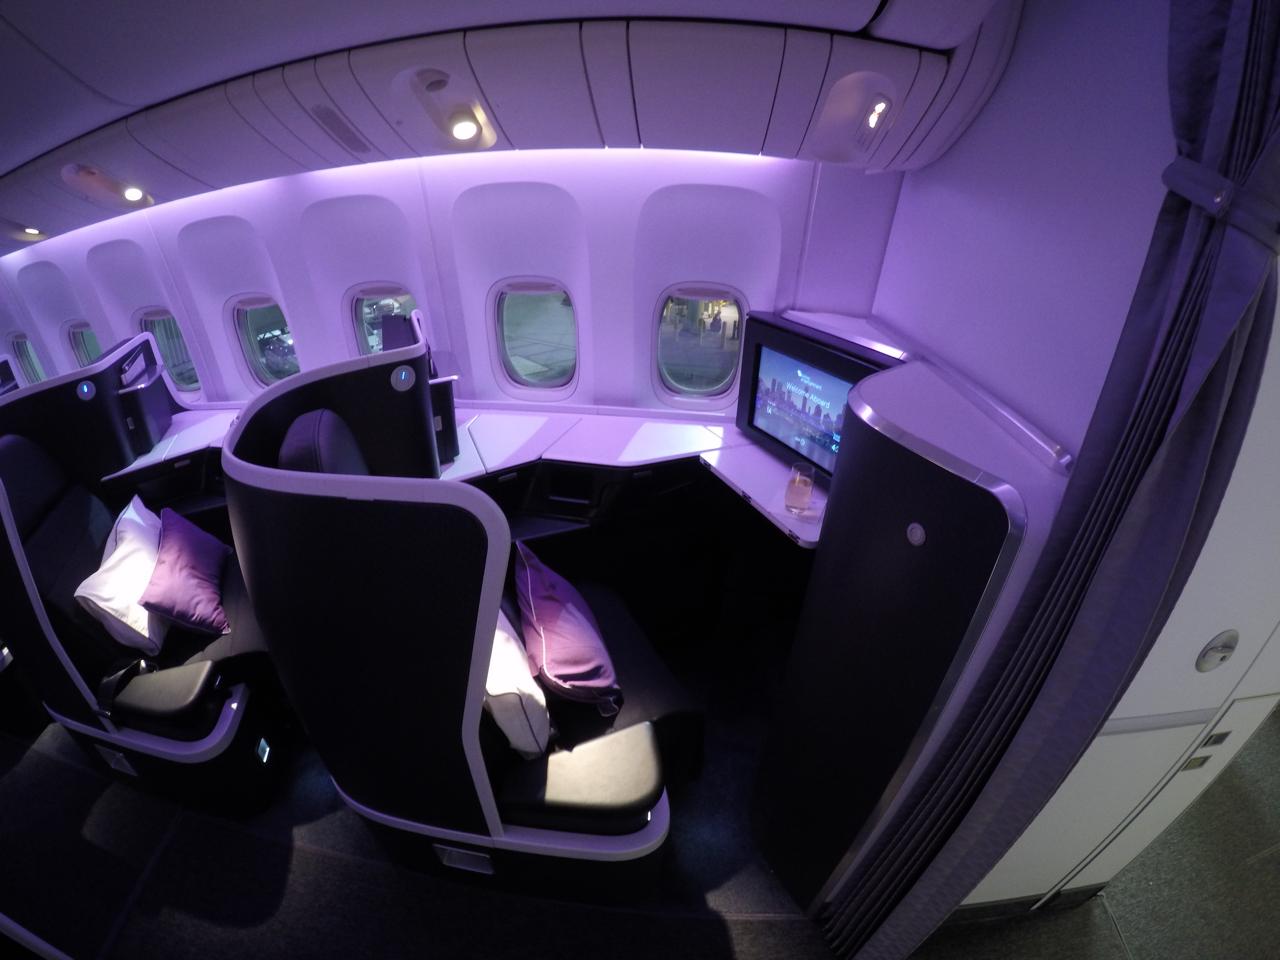 Virgin Australia Business Class: LAX-BNE B777-300ER – Palo Will Travel